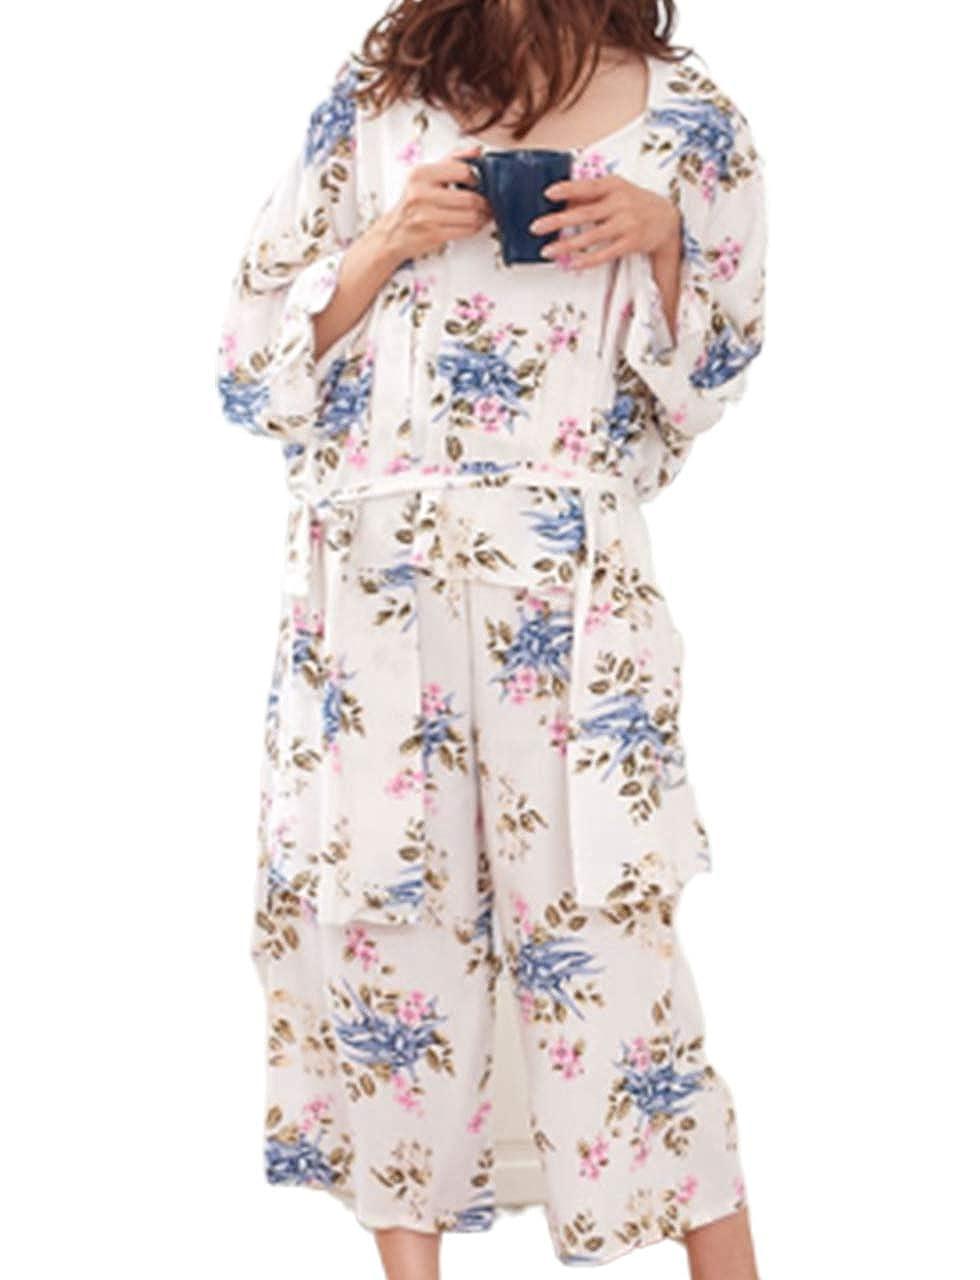 Camellia White PT&Key Women's Sleepwear Sets Elegant 3pcs Pajamas Floral Cami Dressing Gown and Pants Suits